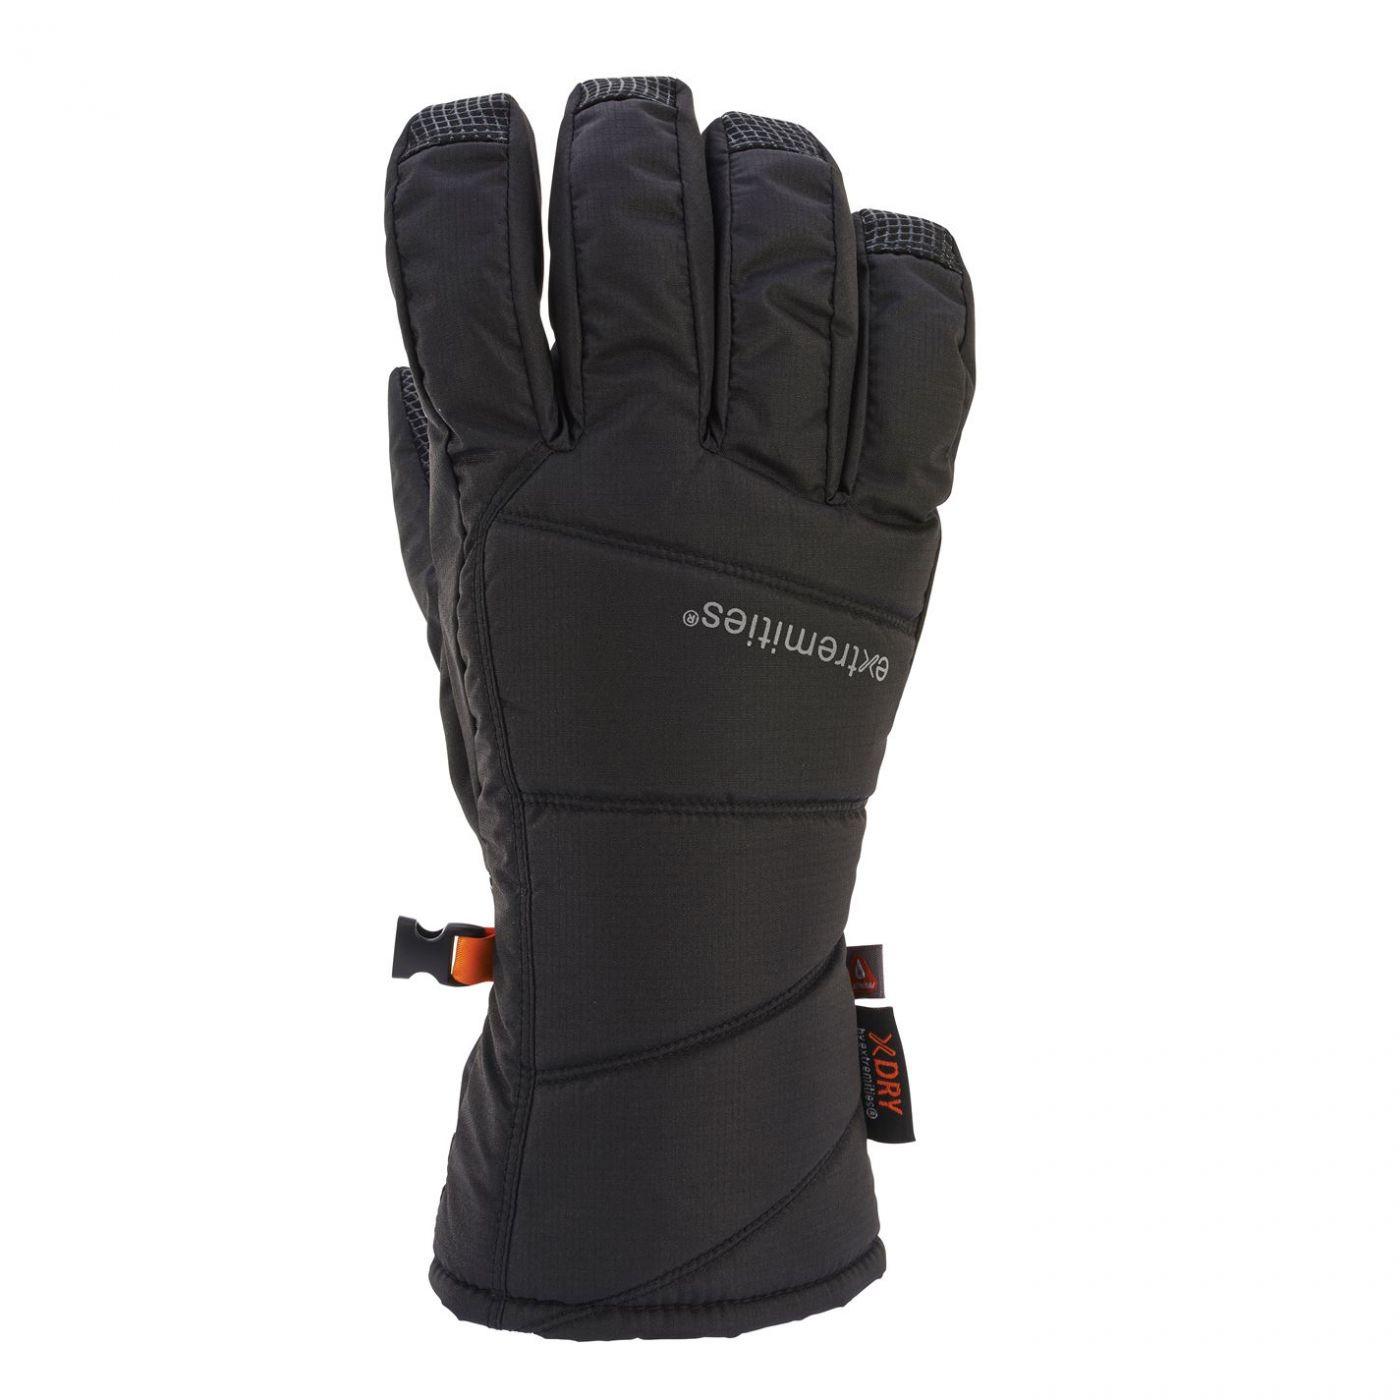 Extremities Trail Glove 91